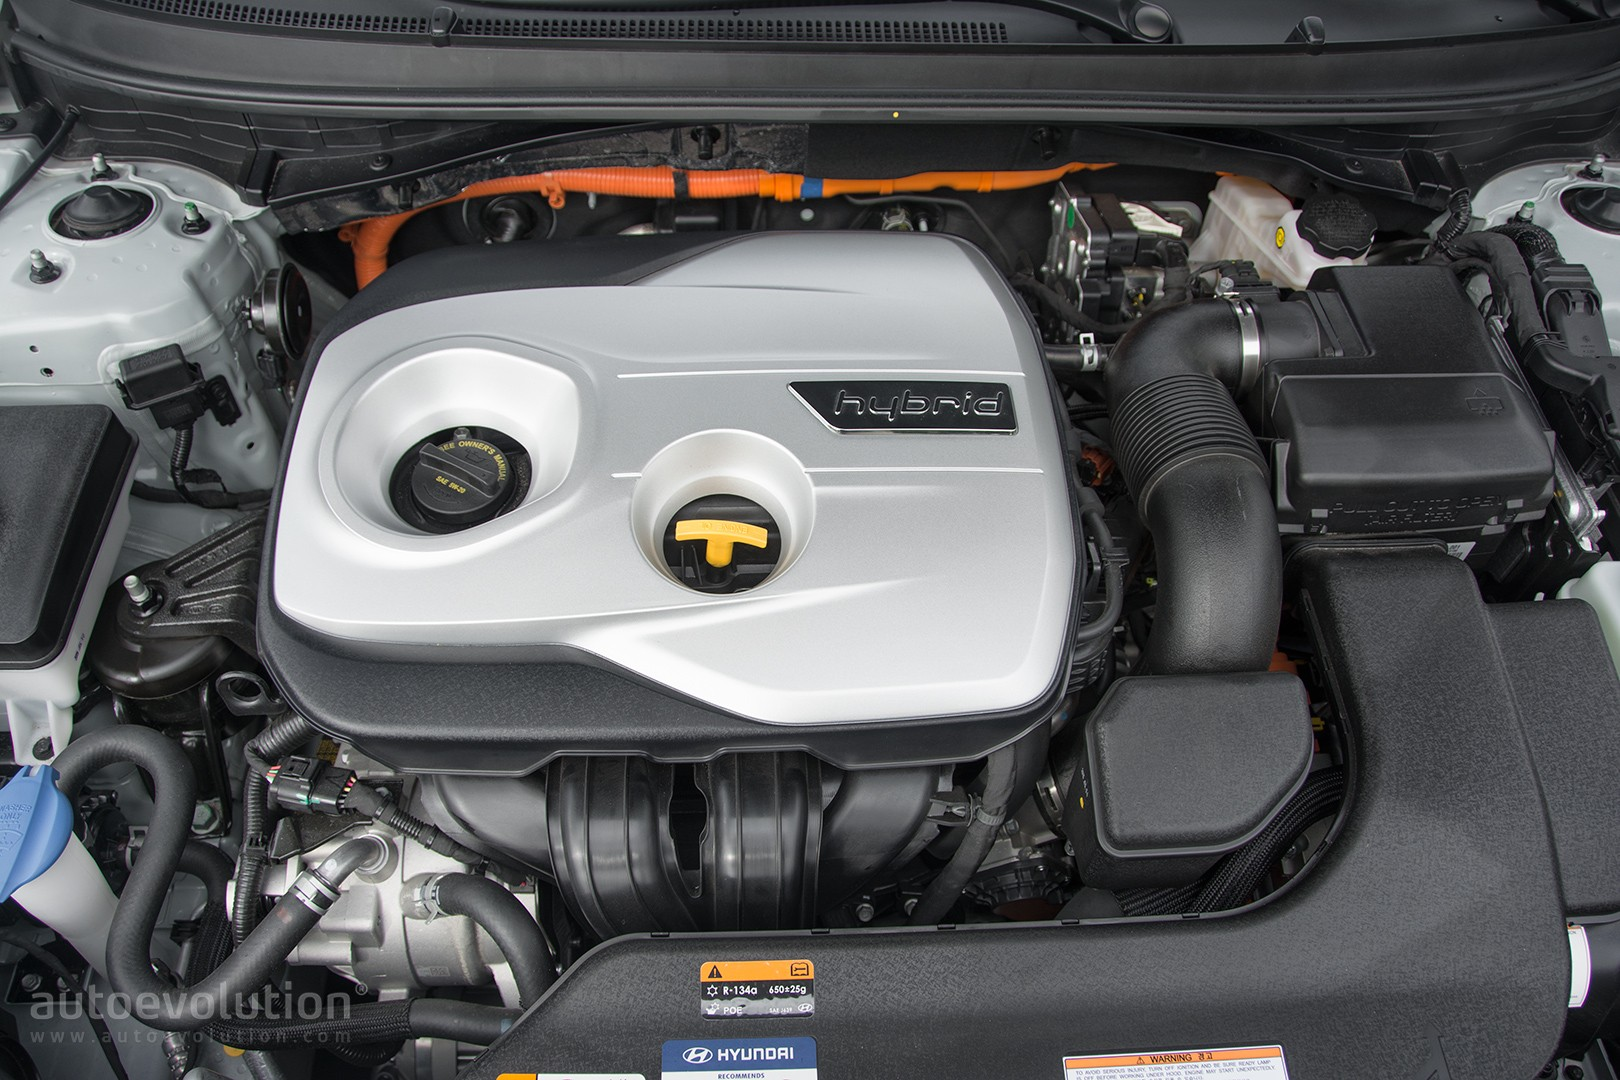 Hyundai hybrid engine on hyundai images tractor service and